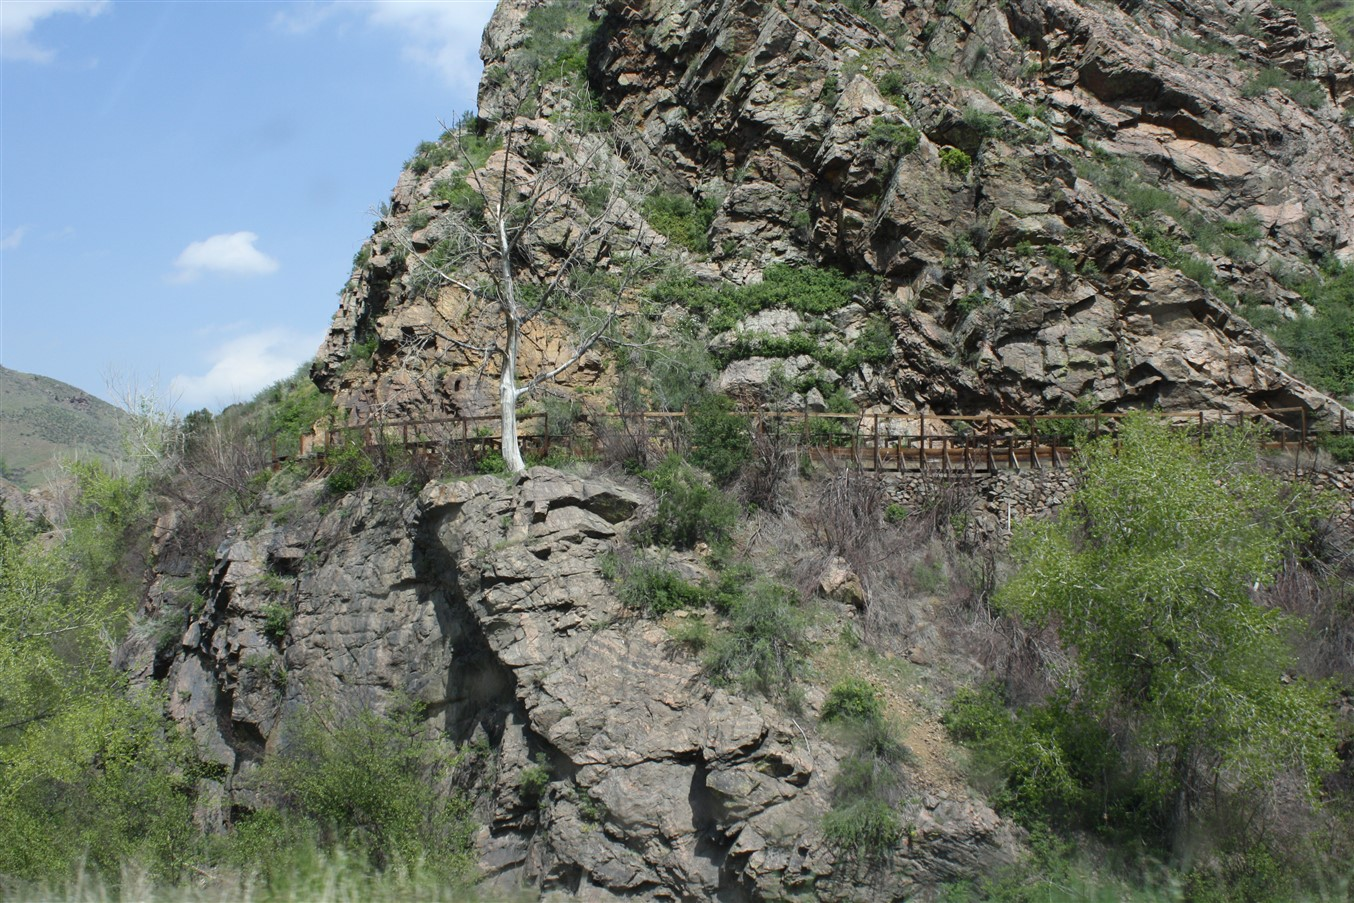 2010 05 20 Colorado 73 Clear Creek Canyon.jpg